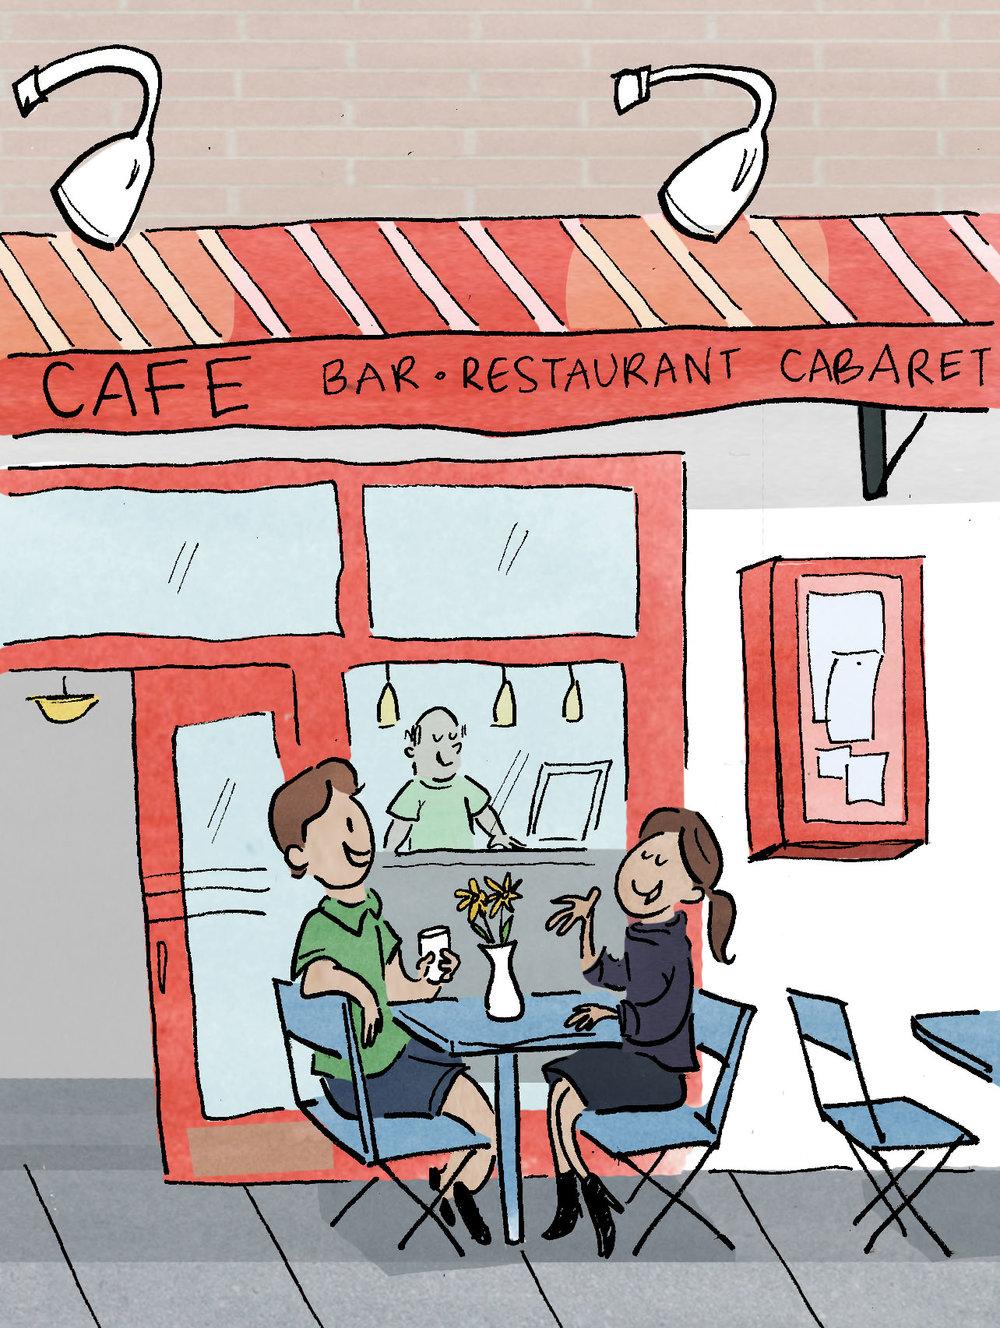 cornelia street cafe.jpg